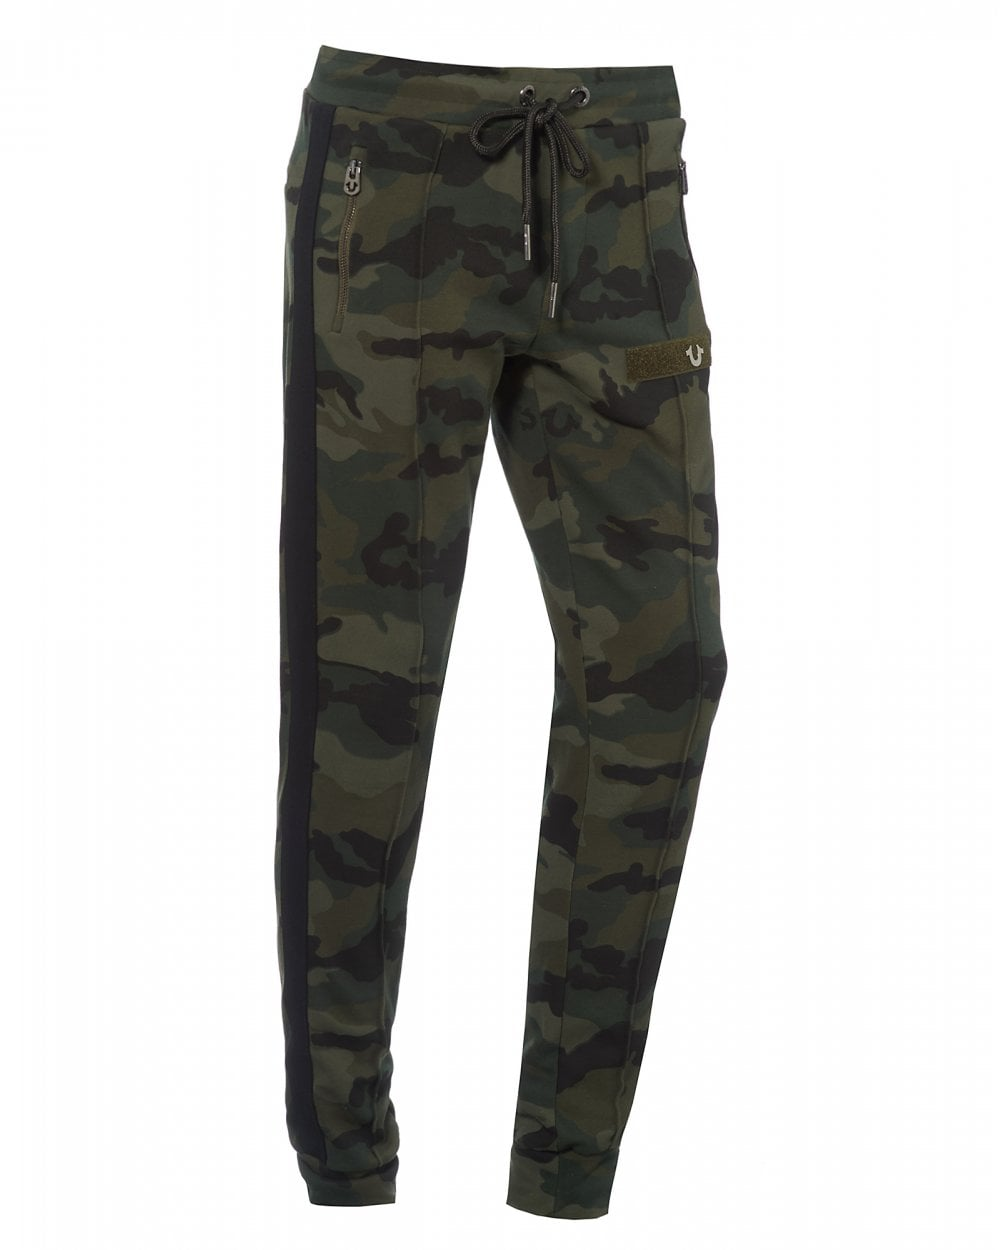 cf4c4a136c True Religion Mens Taped Cuffed Trackpants, Dark Camo Sweatpants